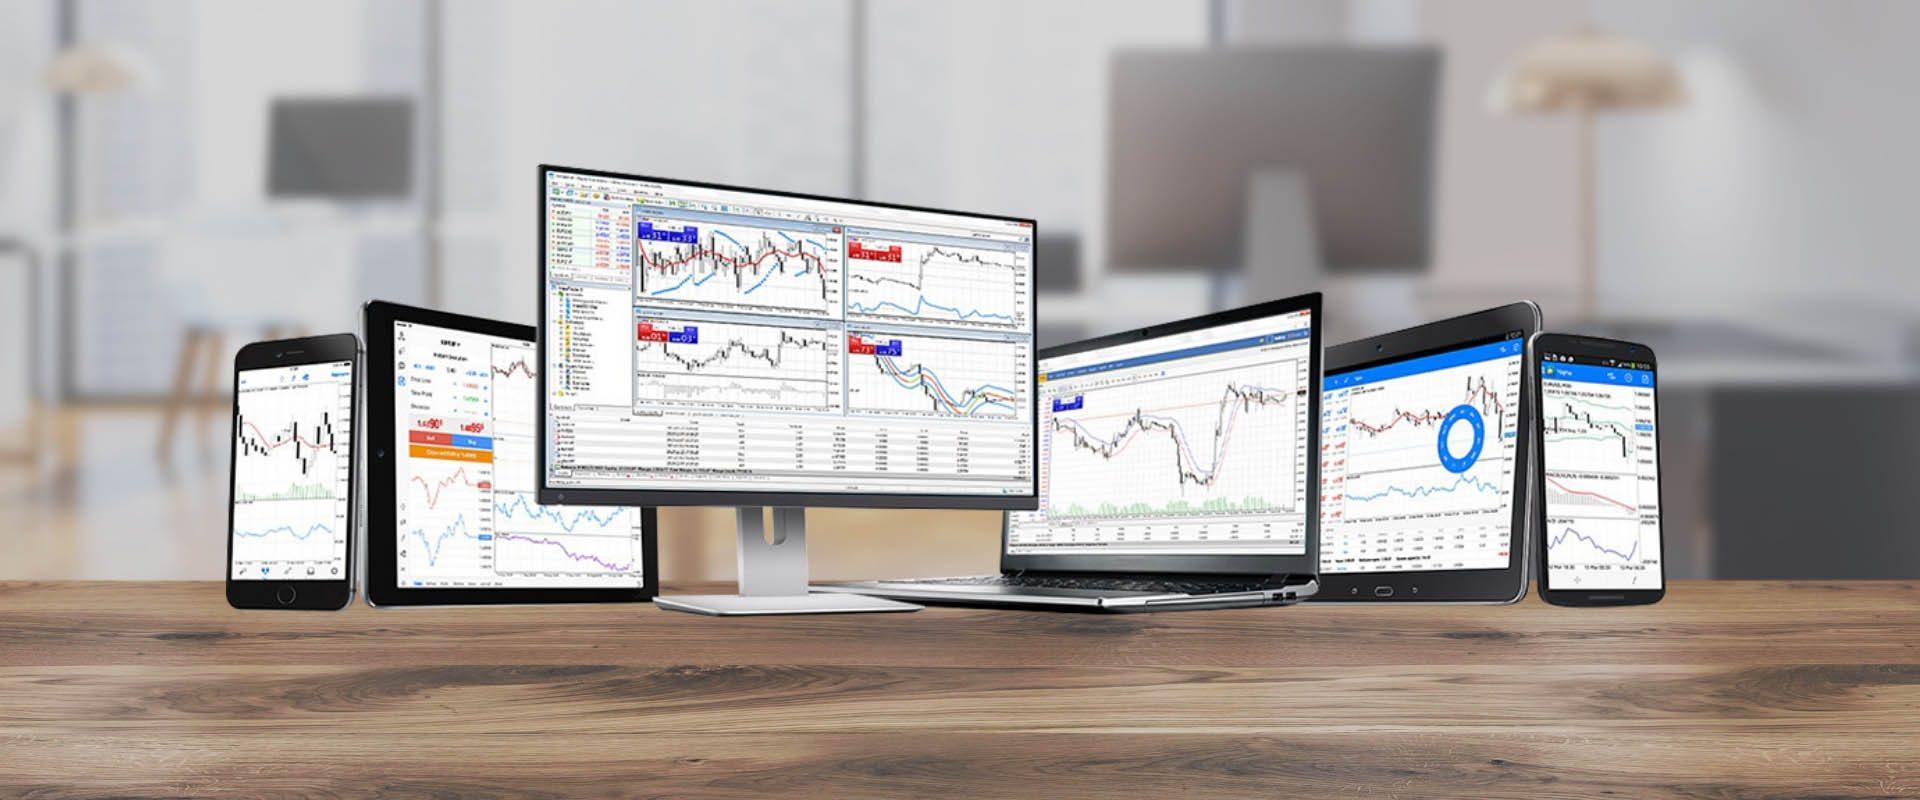 Go trader forex